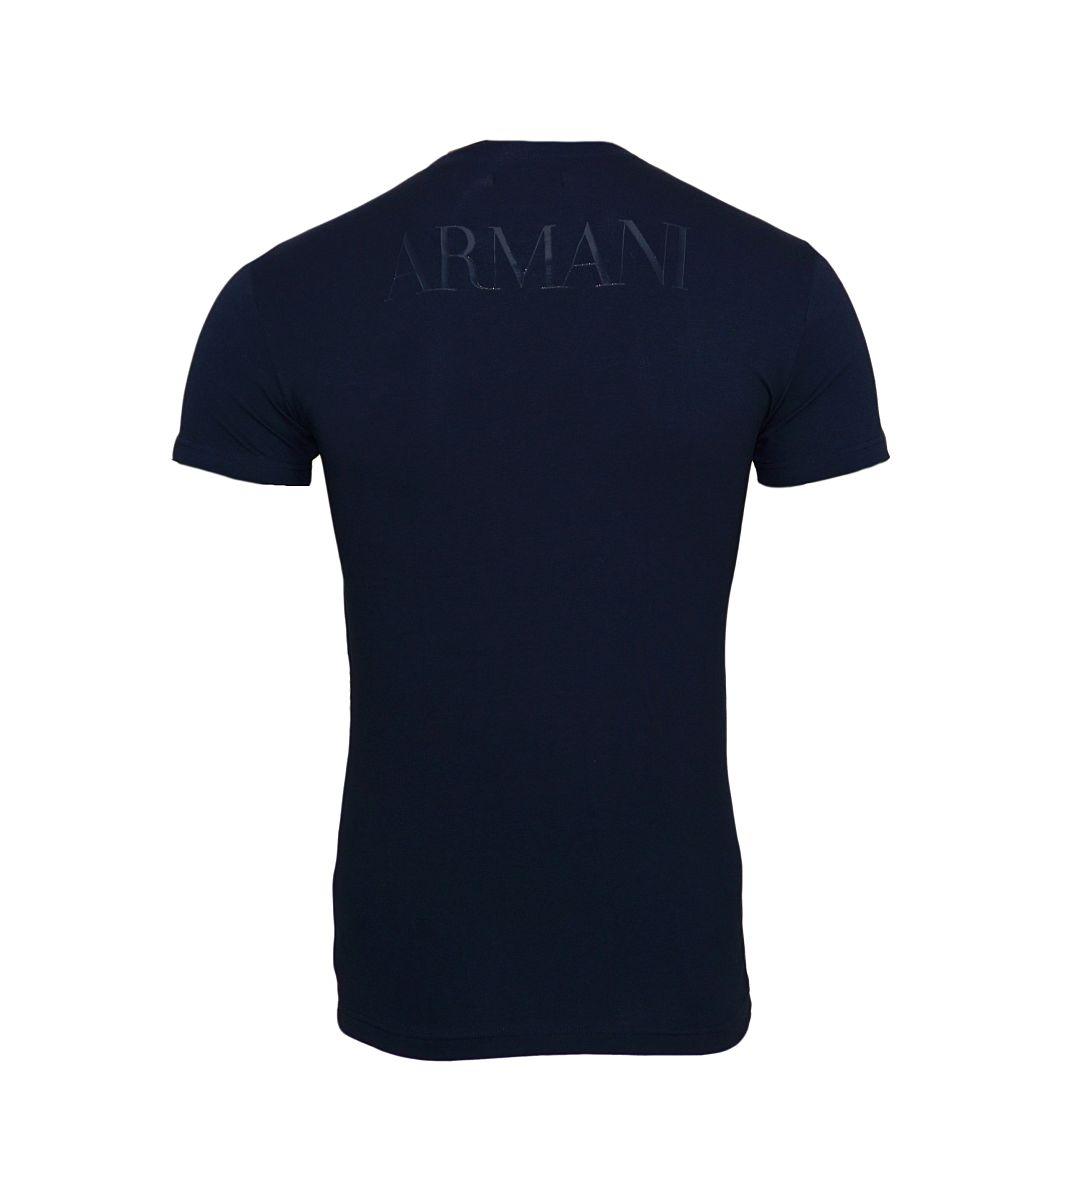 Emporio Armani T-Shirt Rundhals 111035 8P516 00135 MARINE W18-EATS1